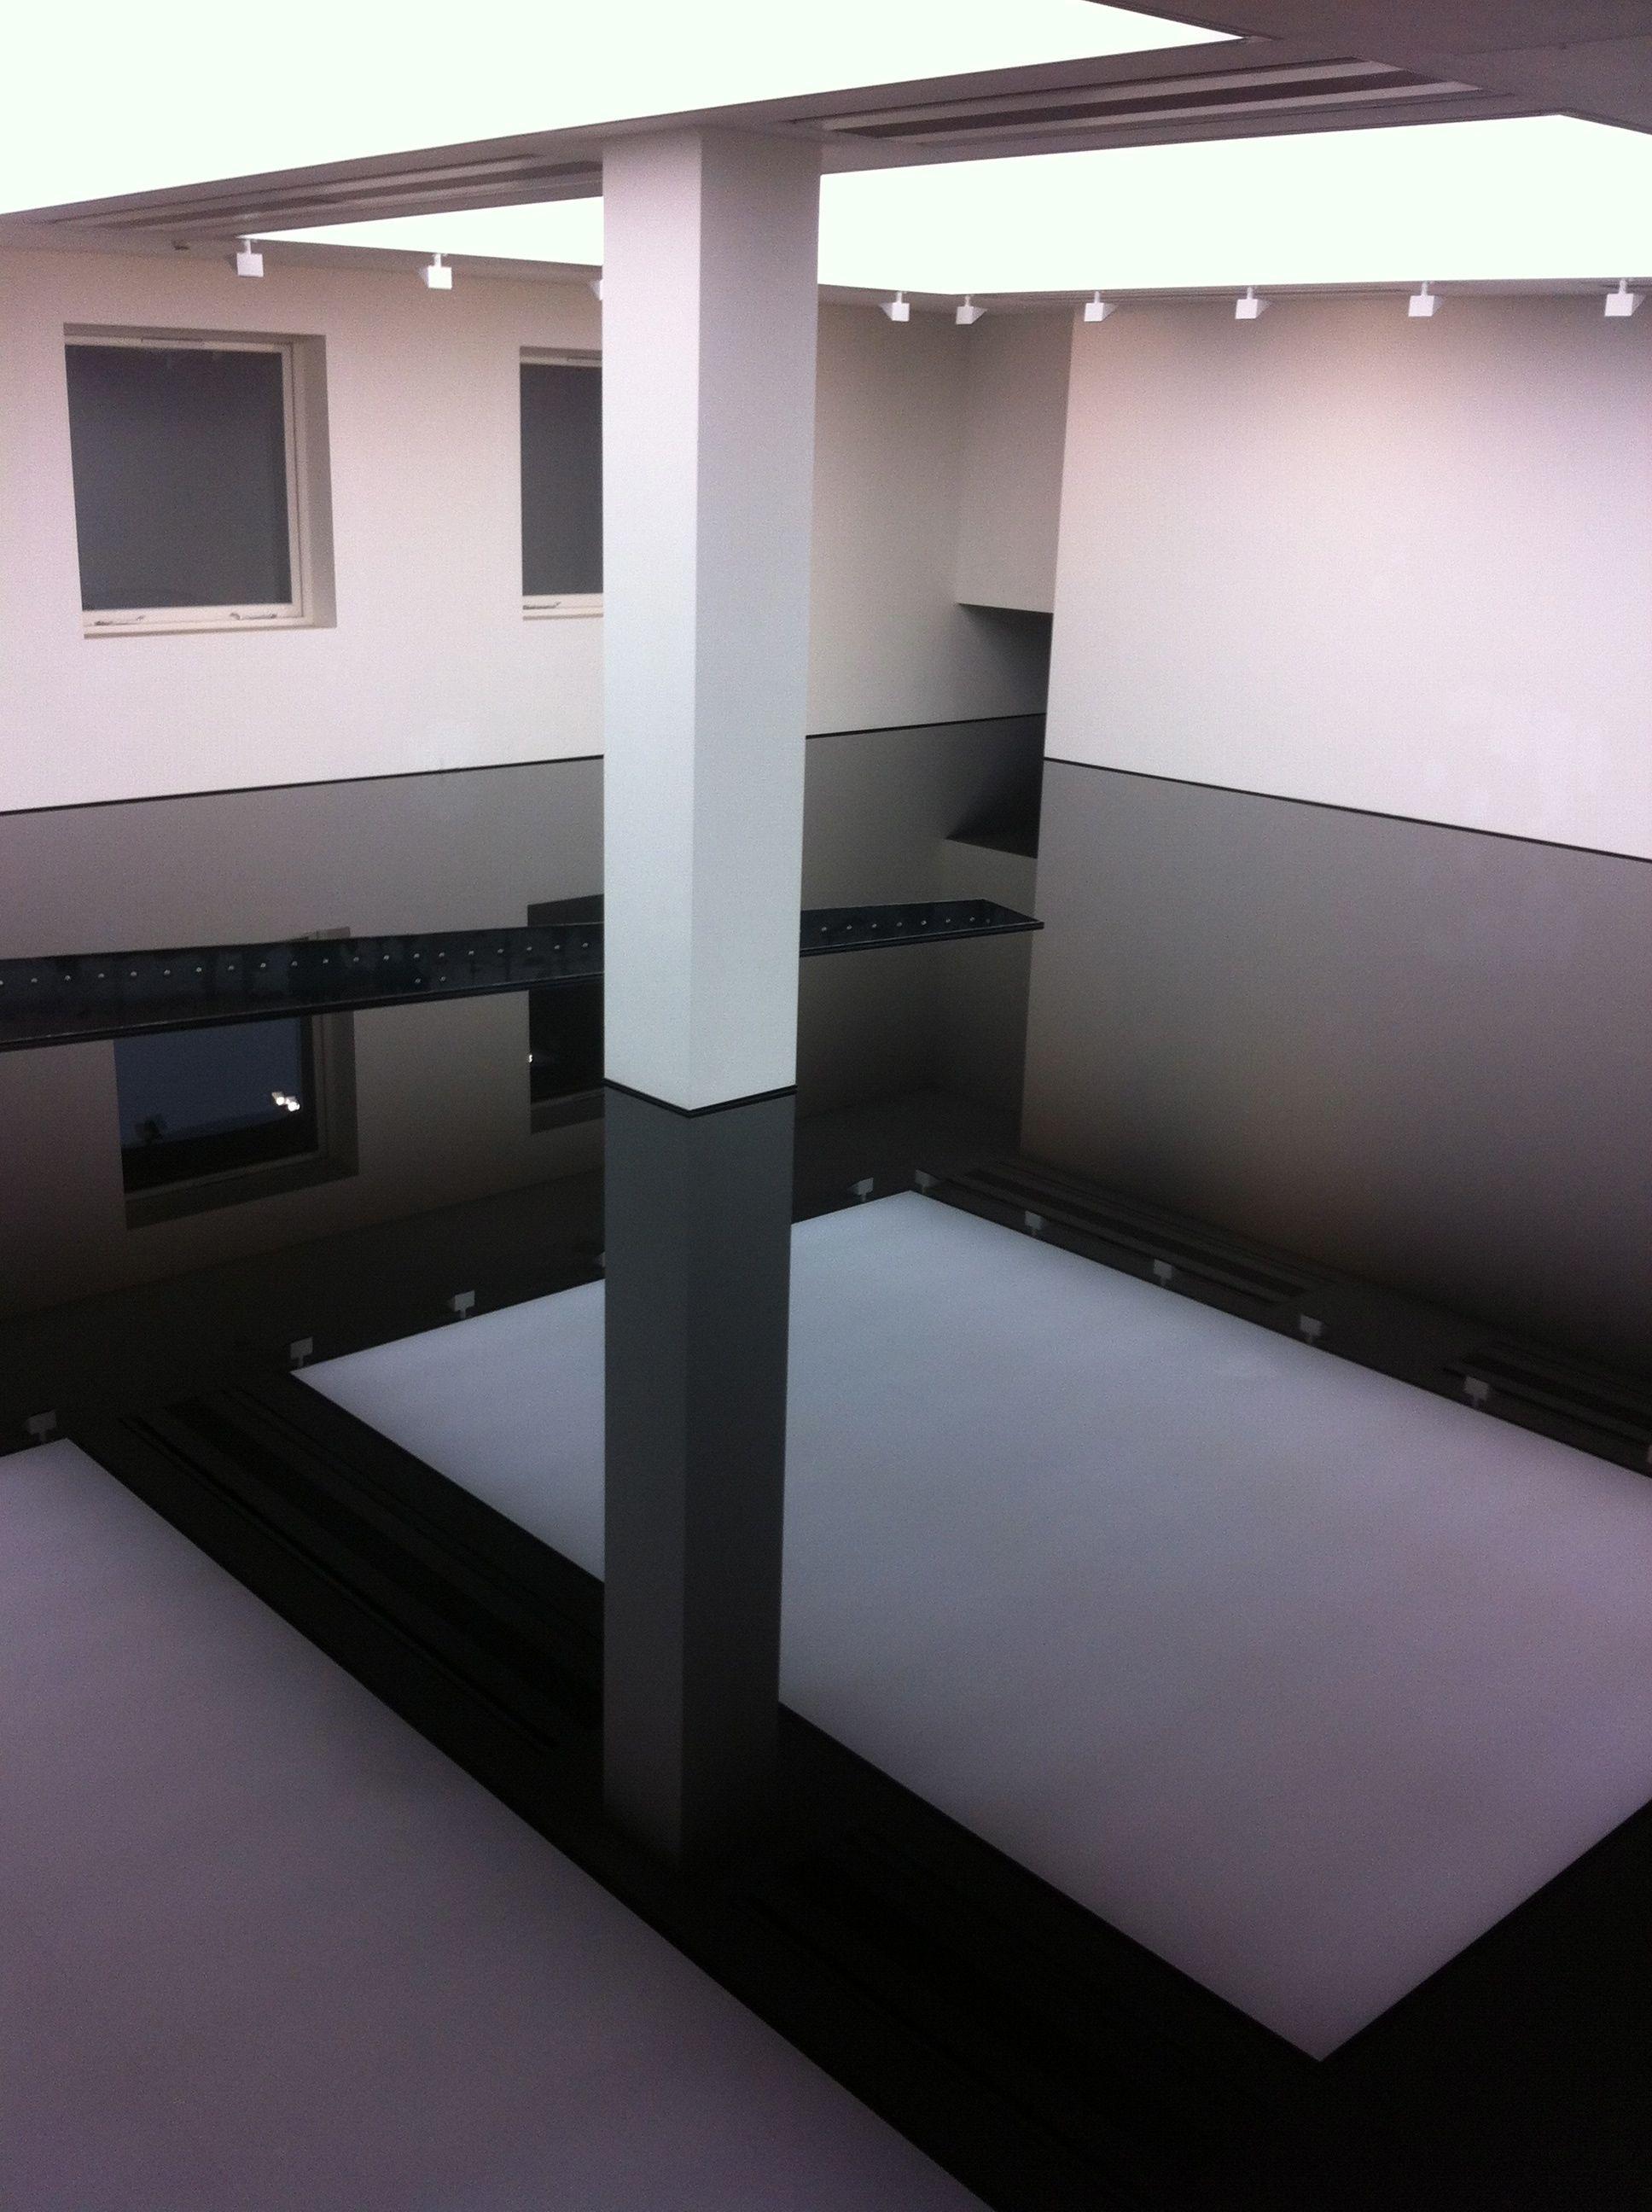 Richard Wilson's Site Specific Oil Installation @ The Saatchi Gallery